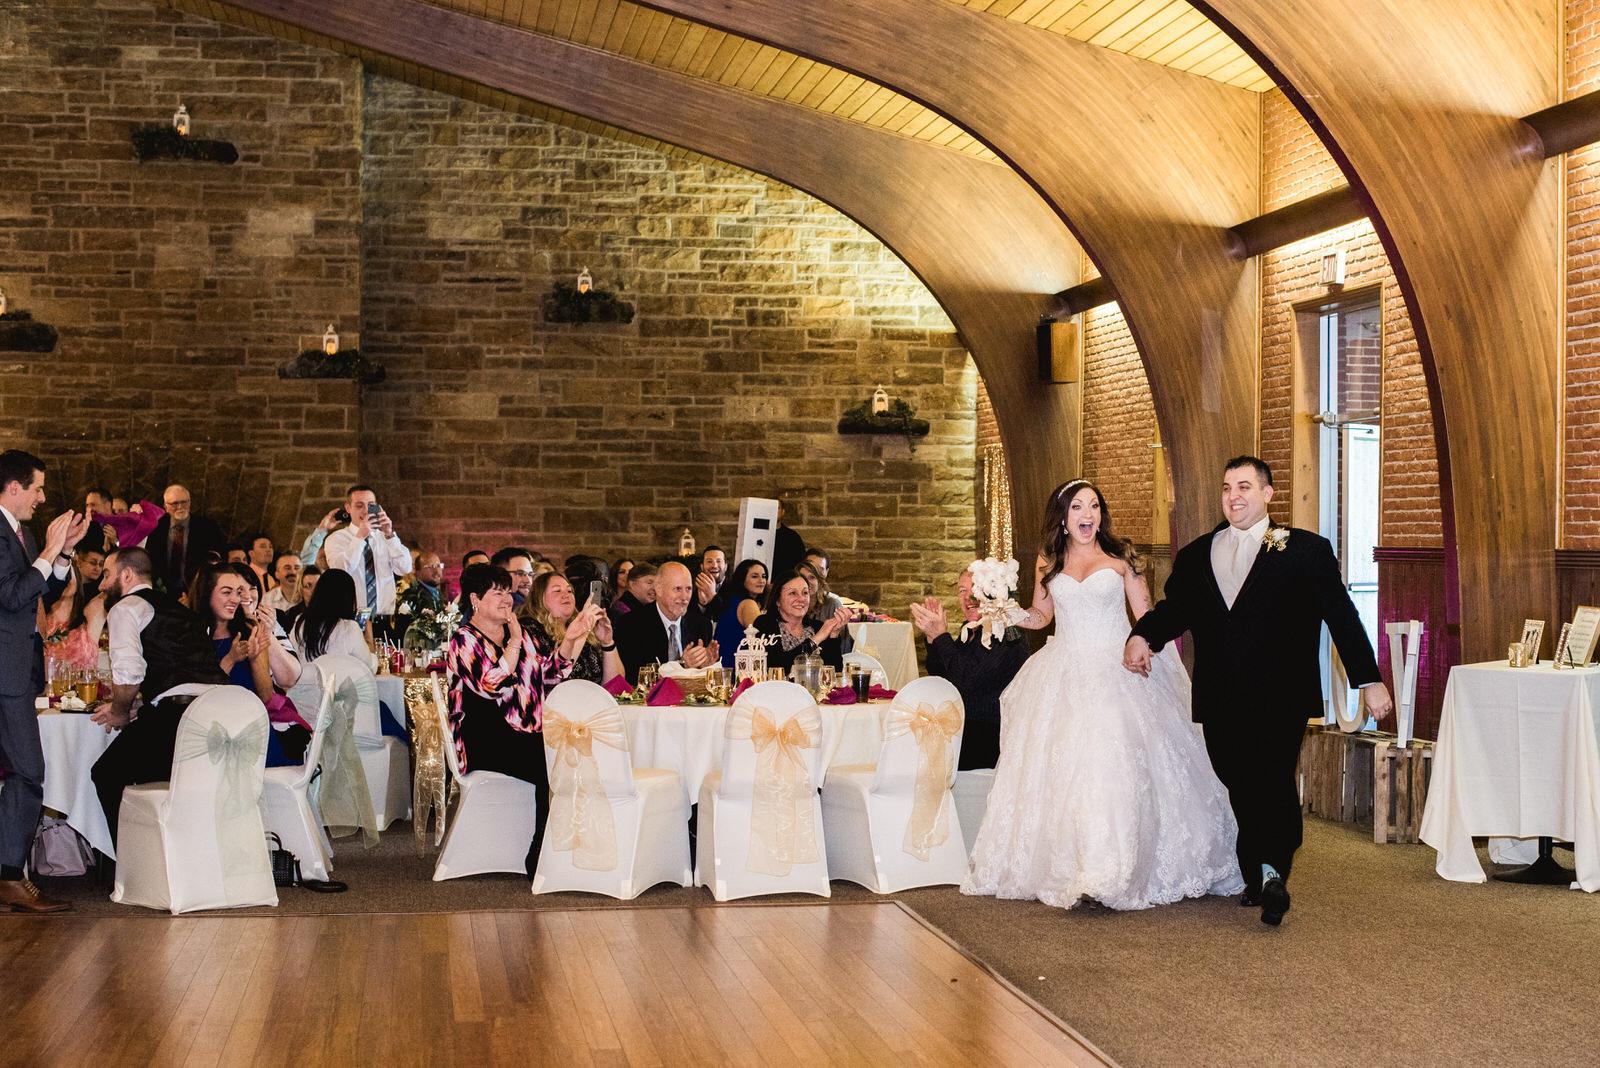 Laube_Banquet_Hall__Wedding_Photos_019.jpg